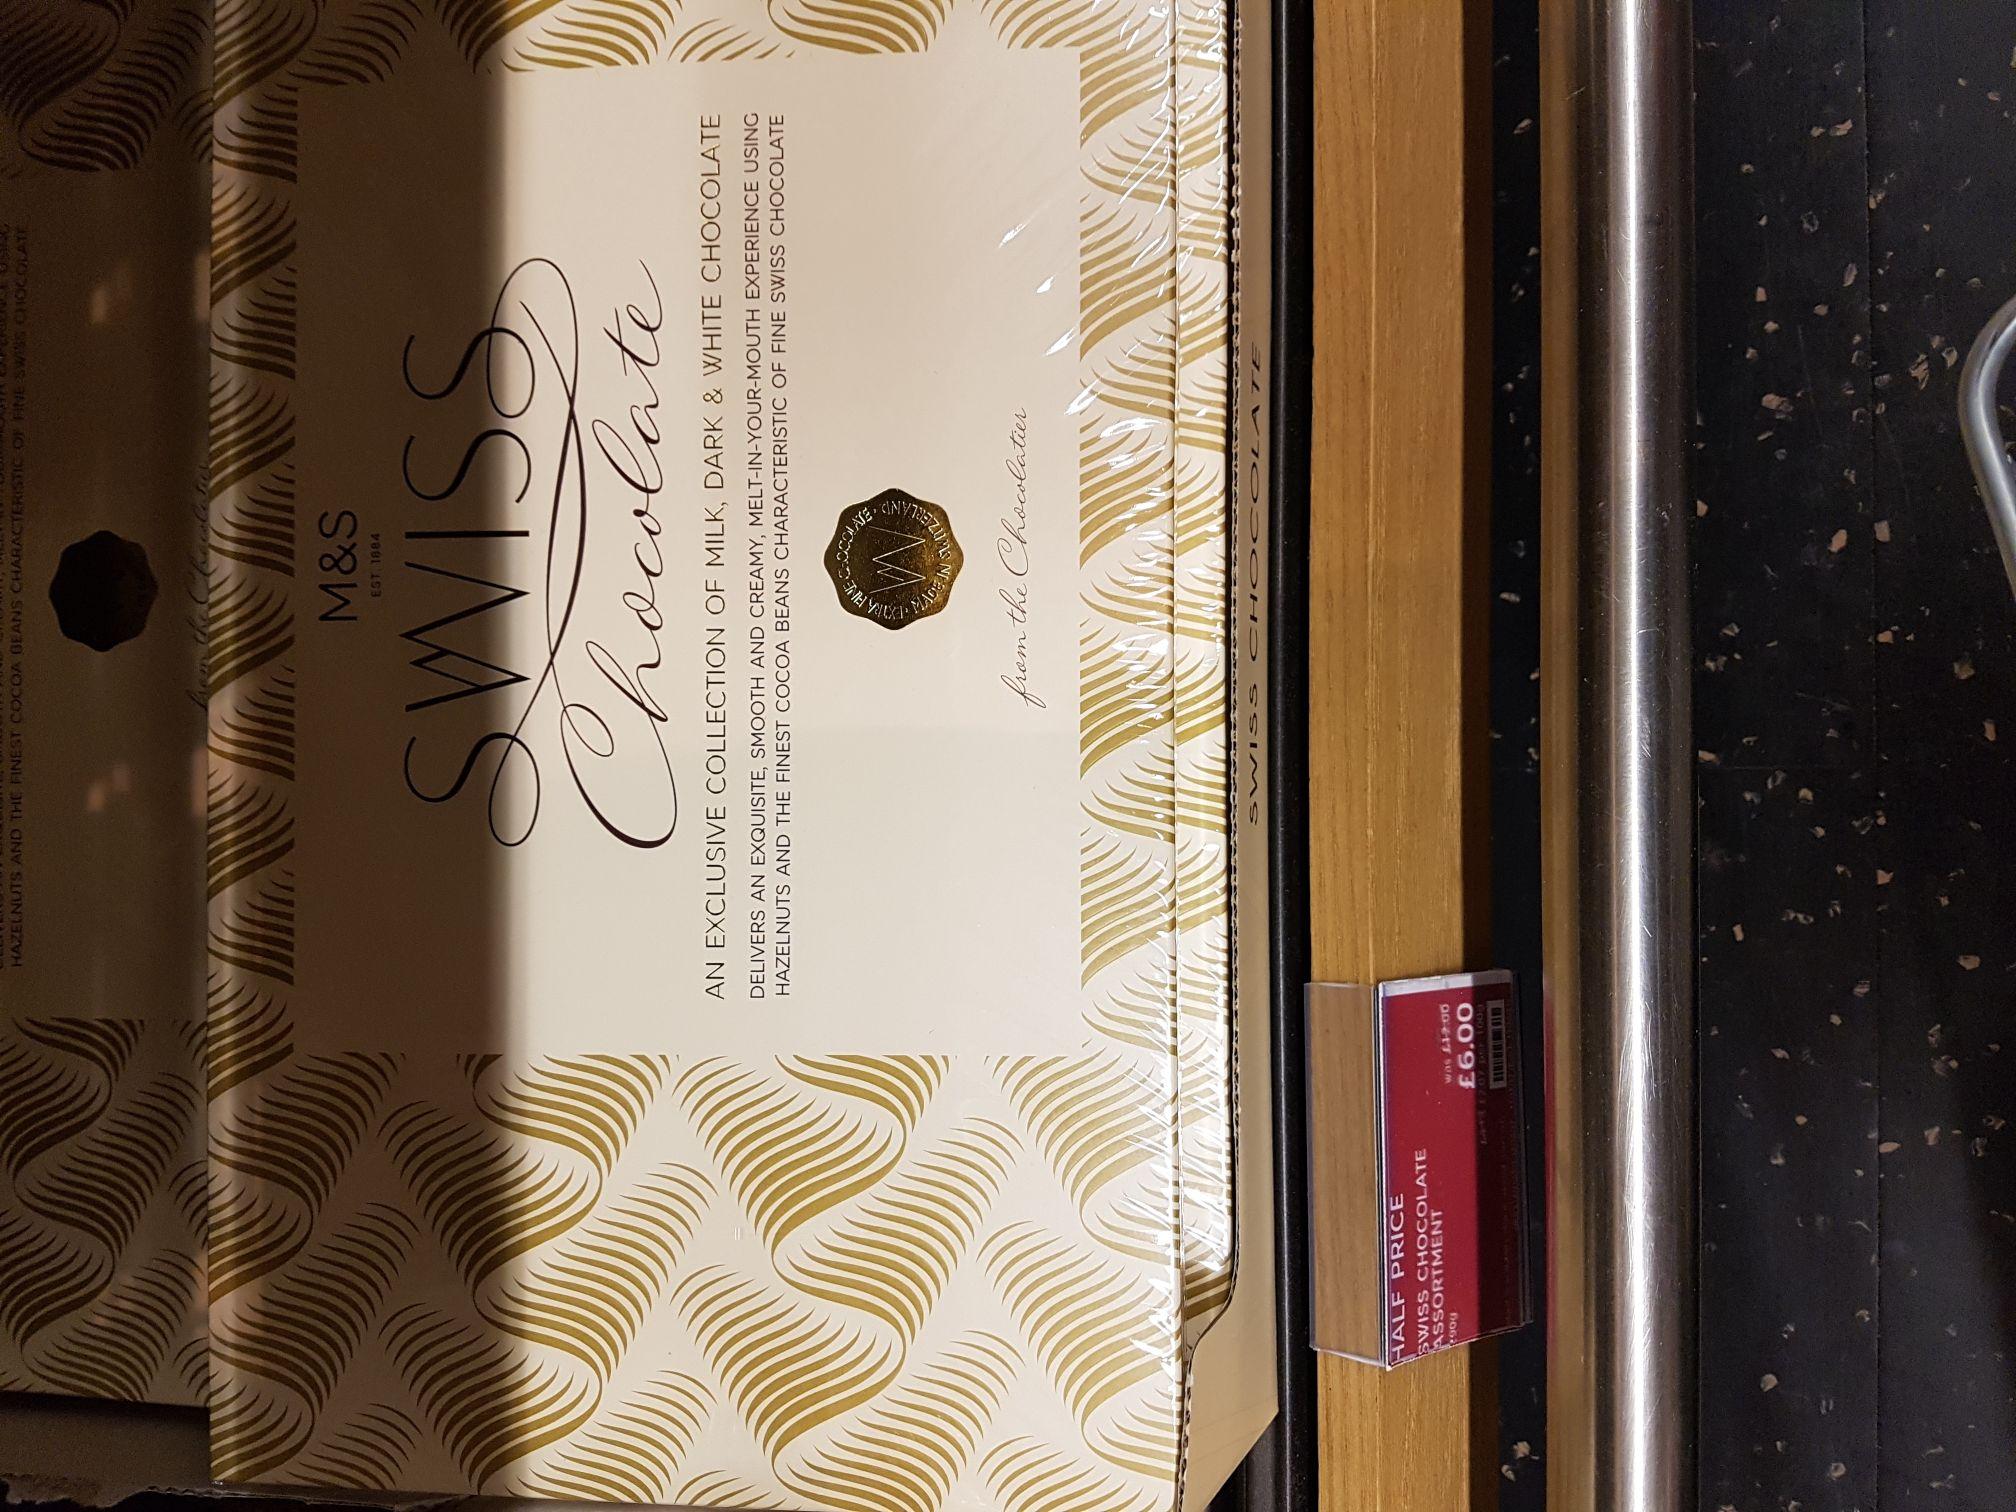 M&S Swiss Chocolate 750g only £6 @ M&S